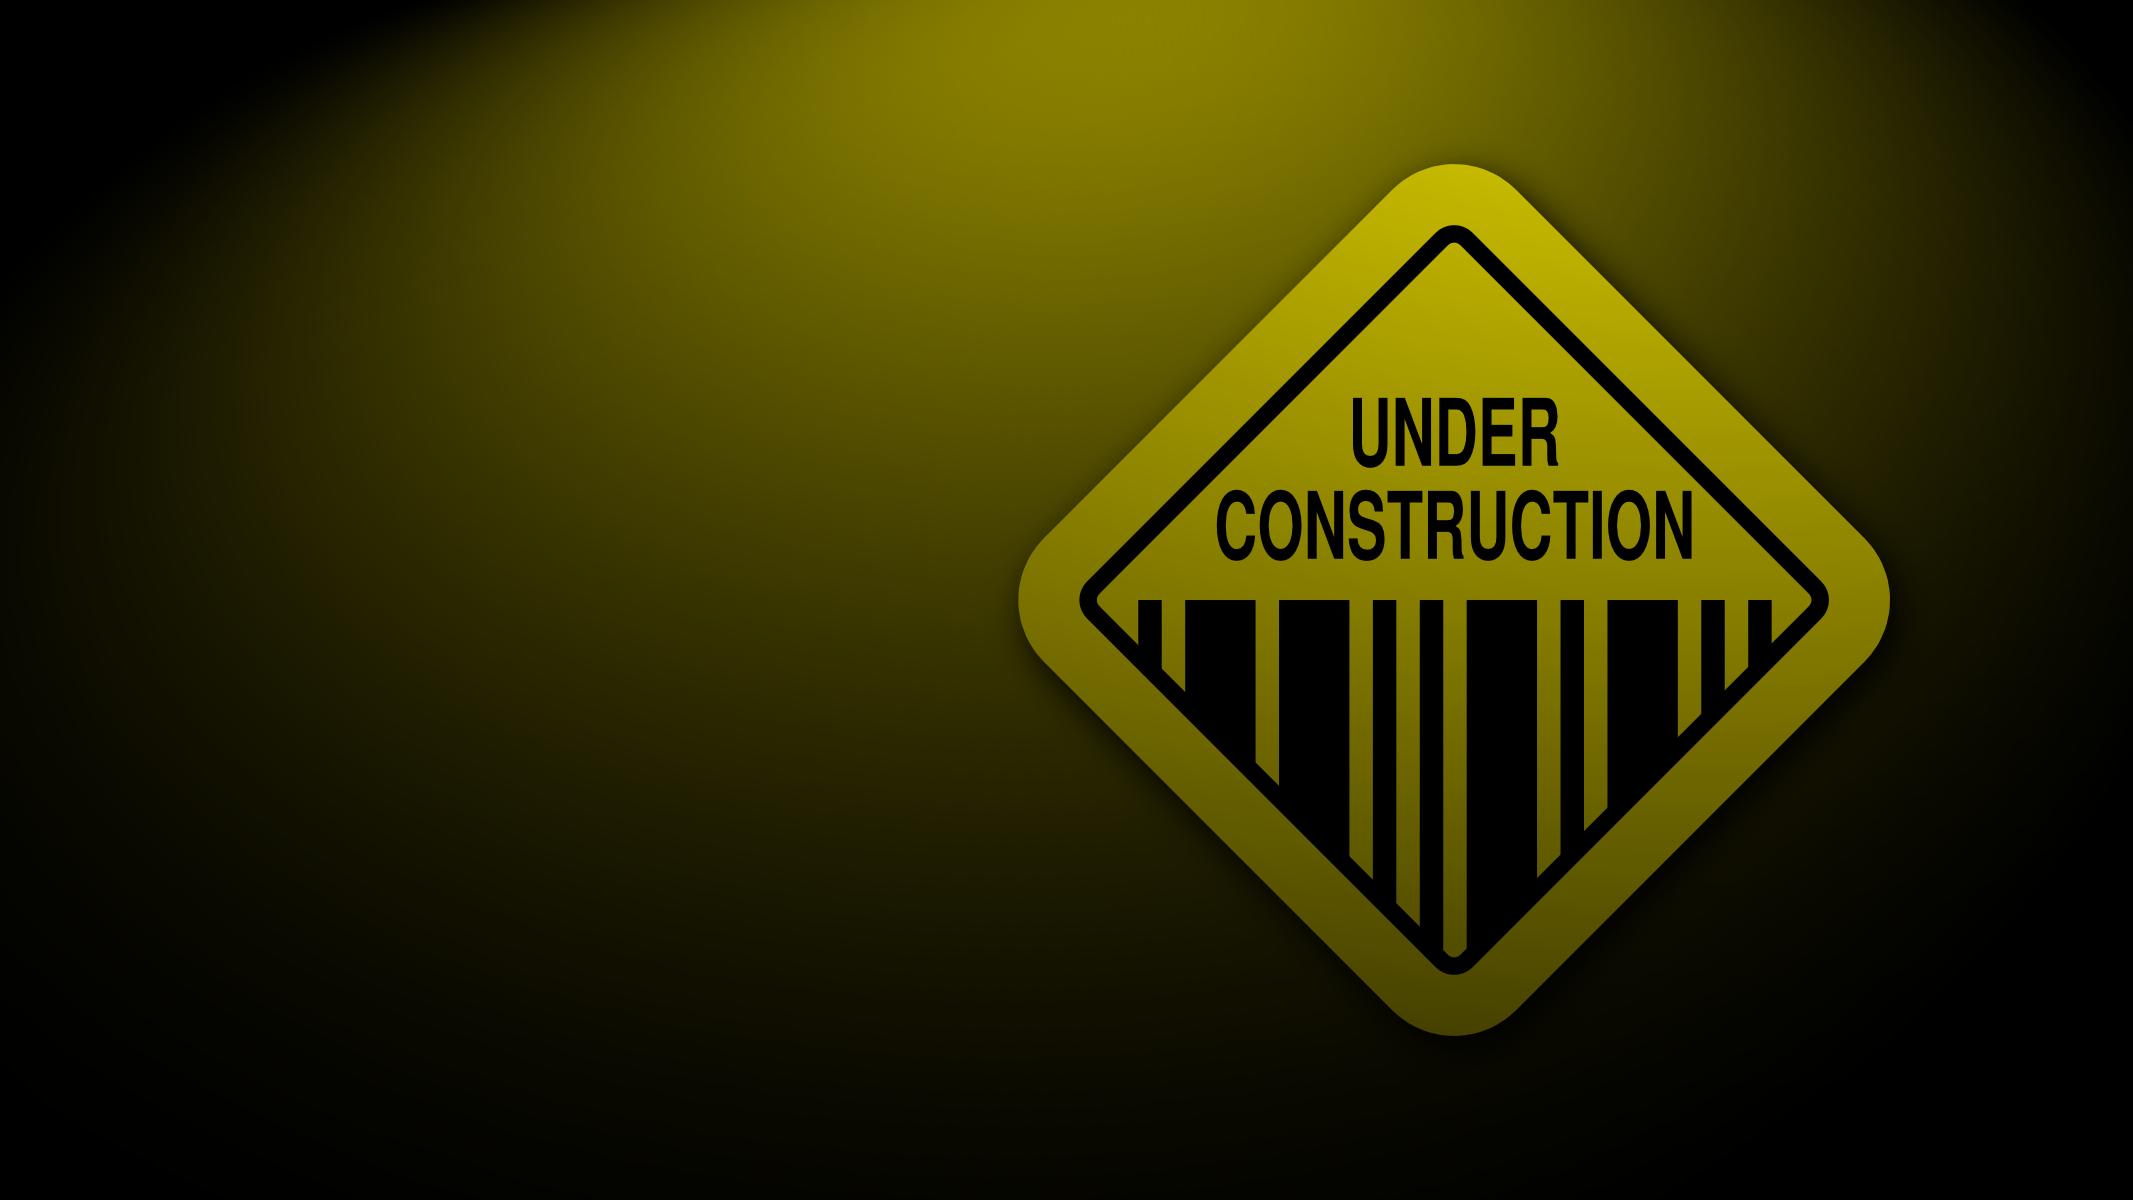 under construction wallpaper wwwpixsharkcom images